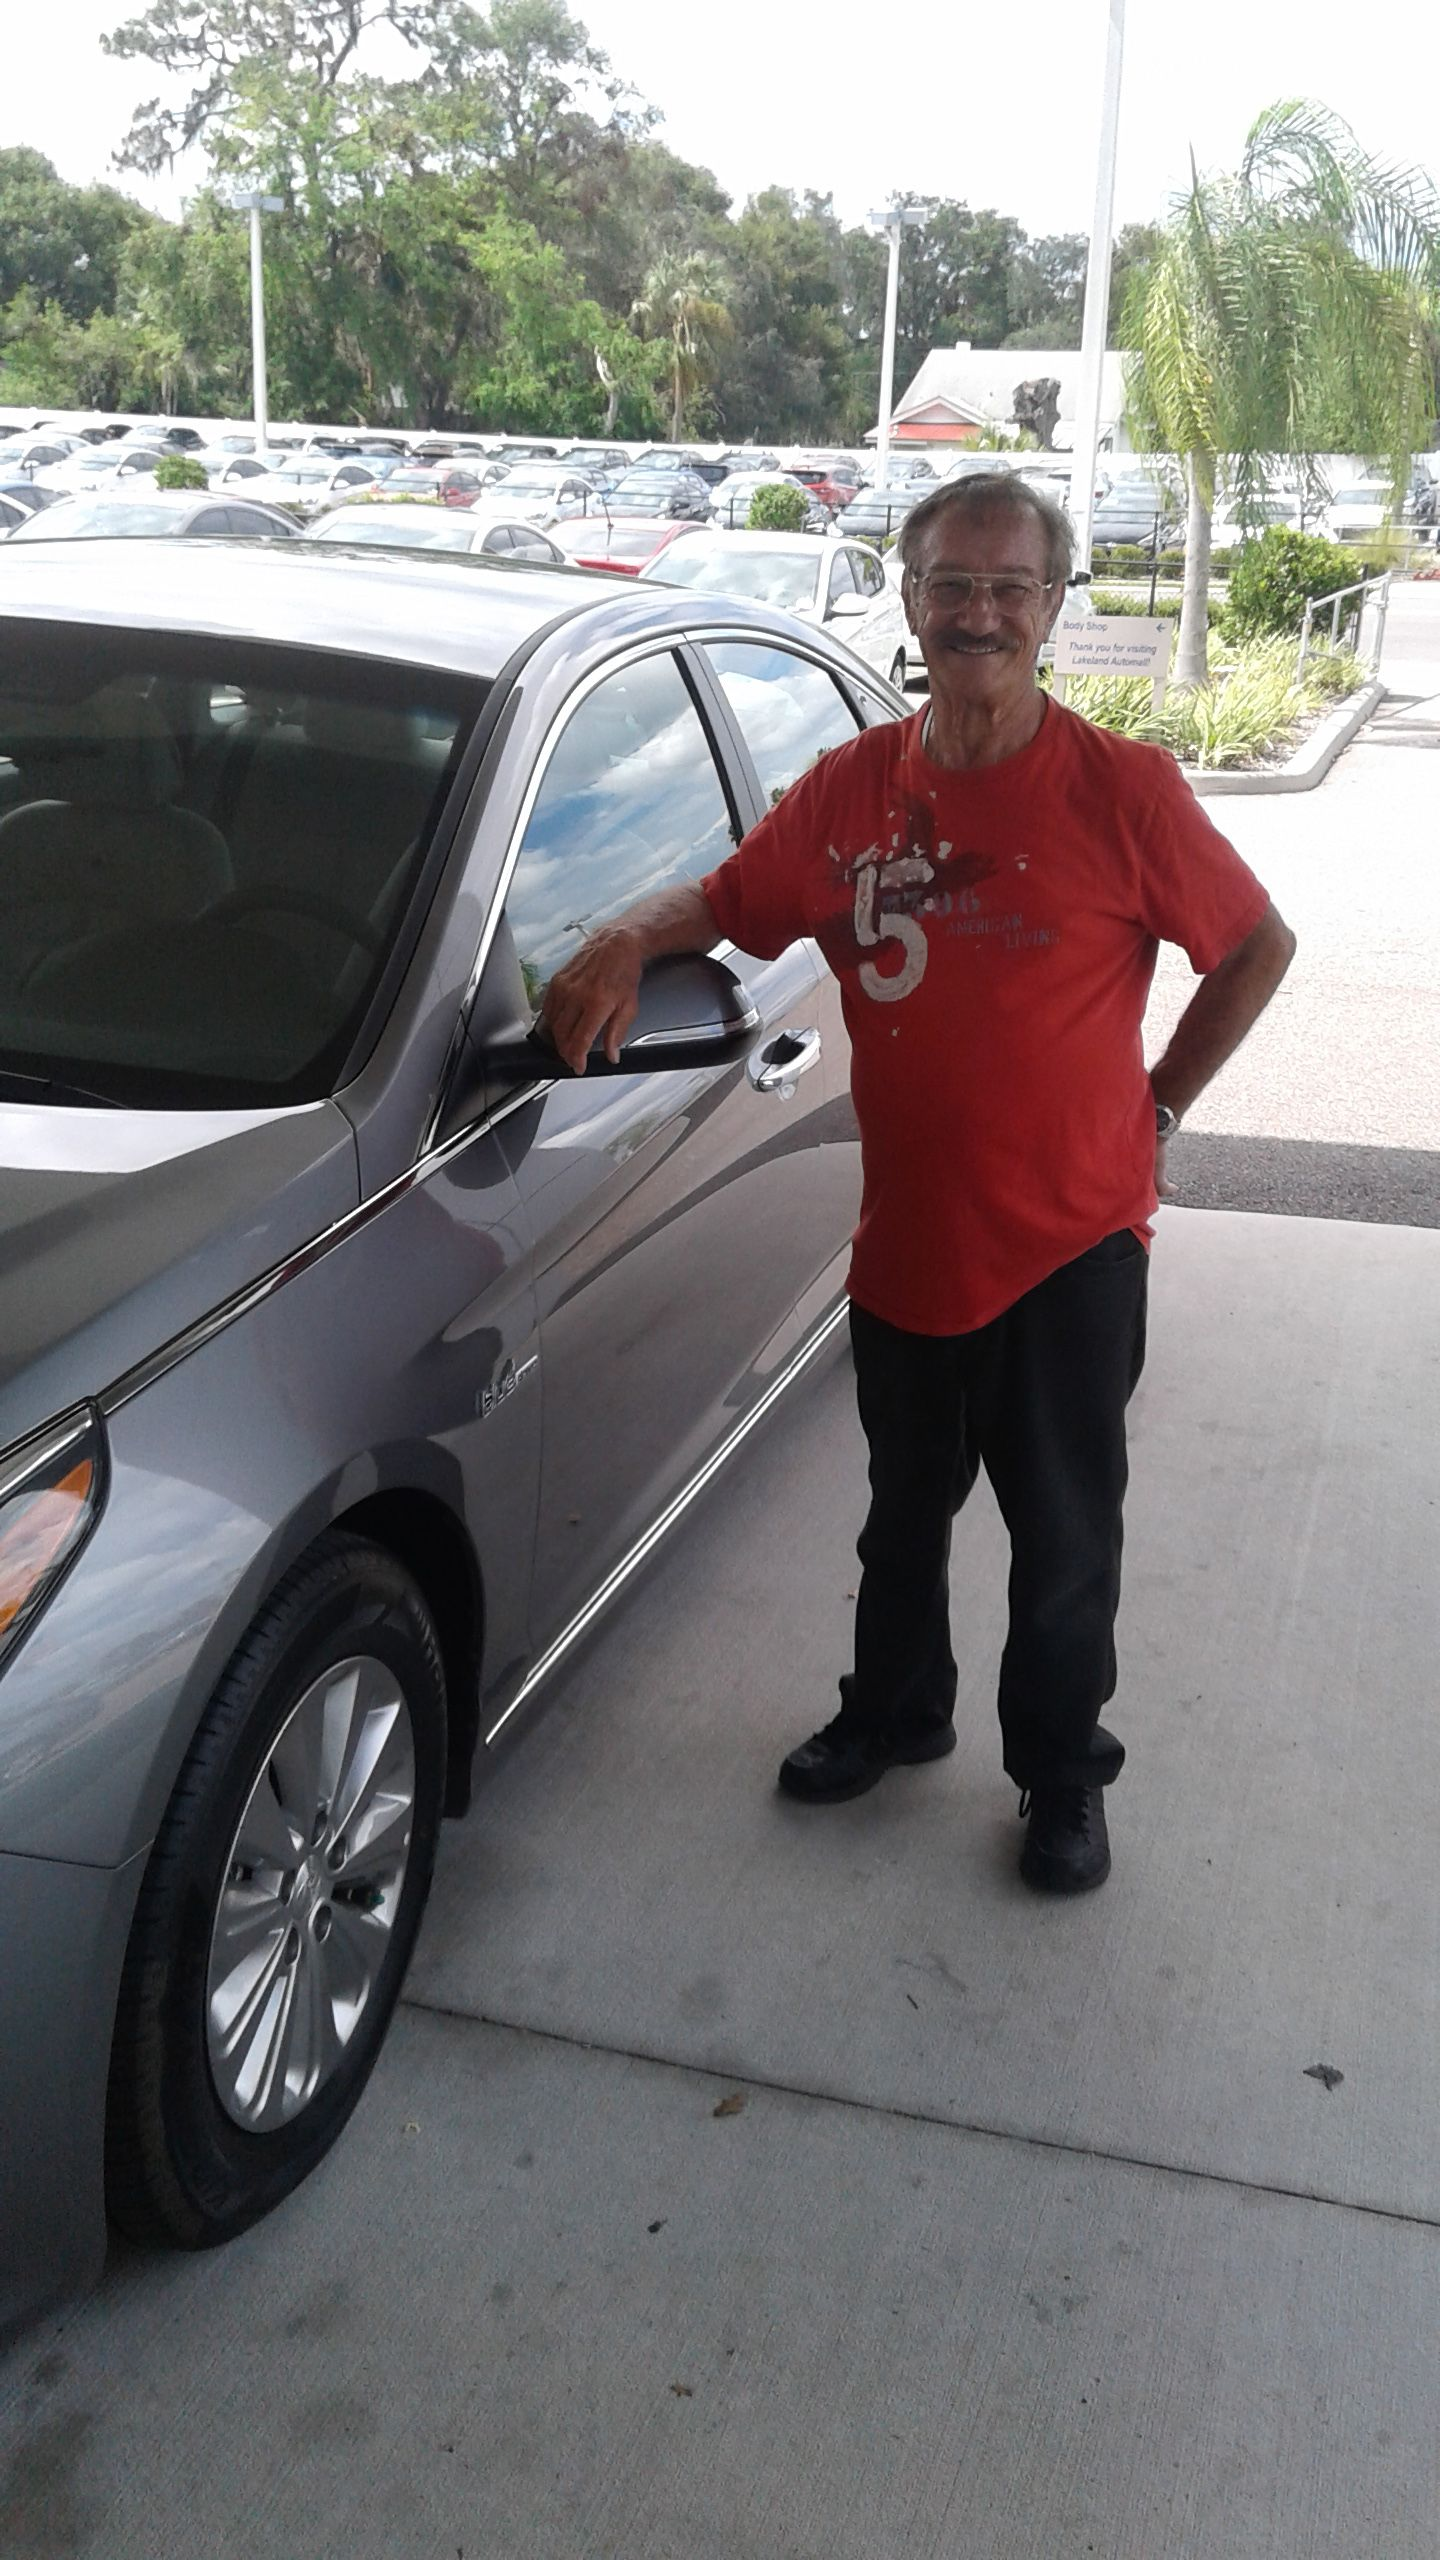 Mr. John Richard came into Lakeland Hyundai in the hopes of finding